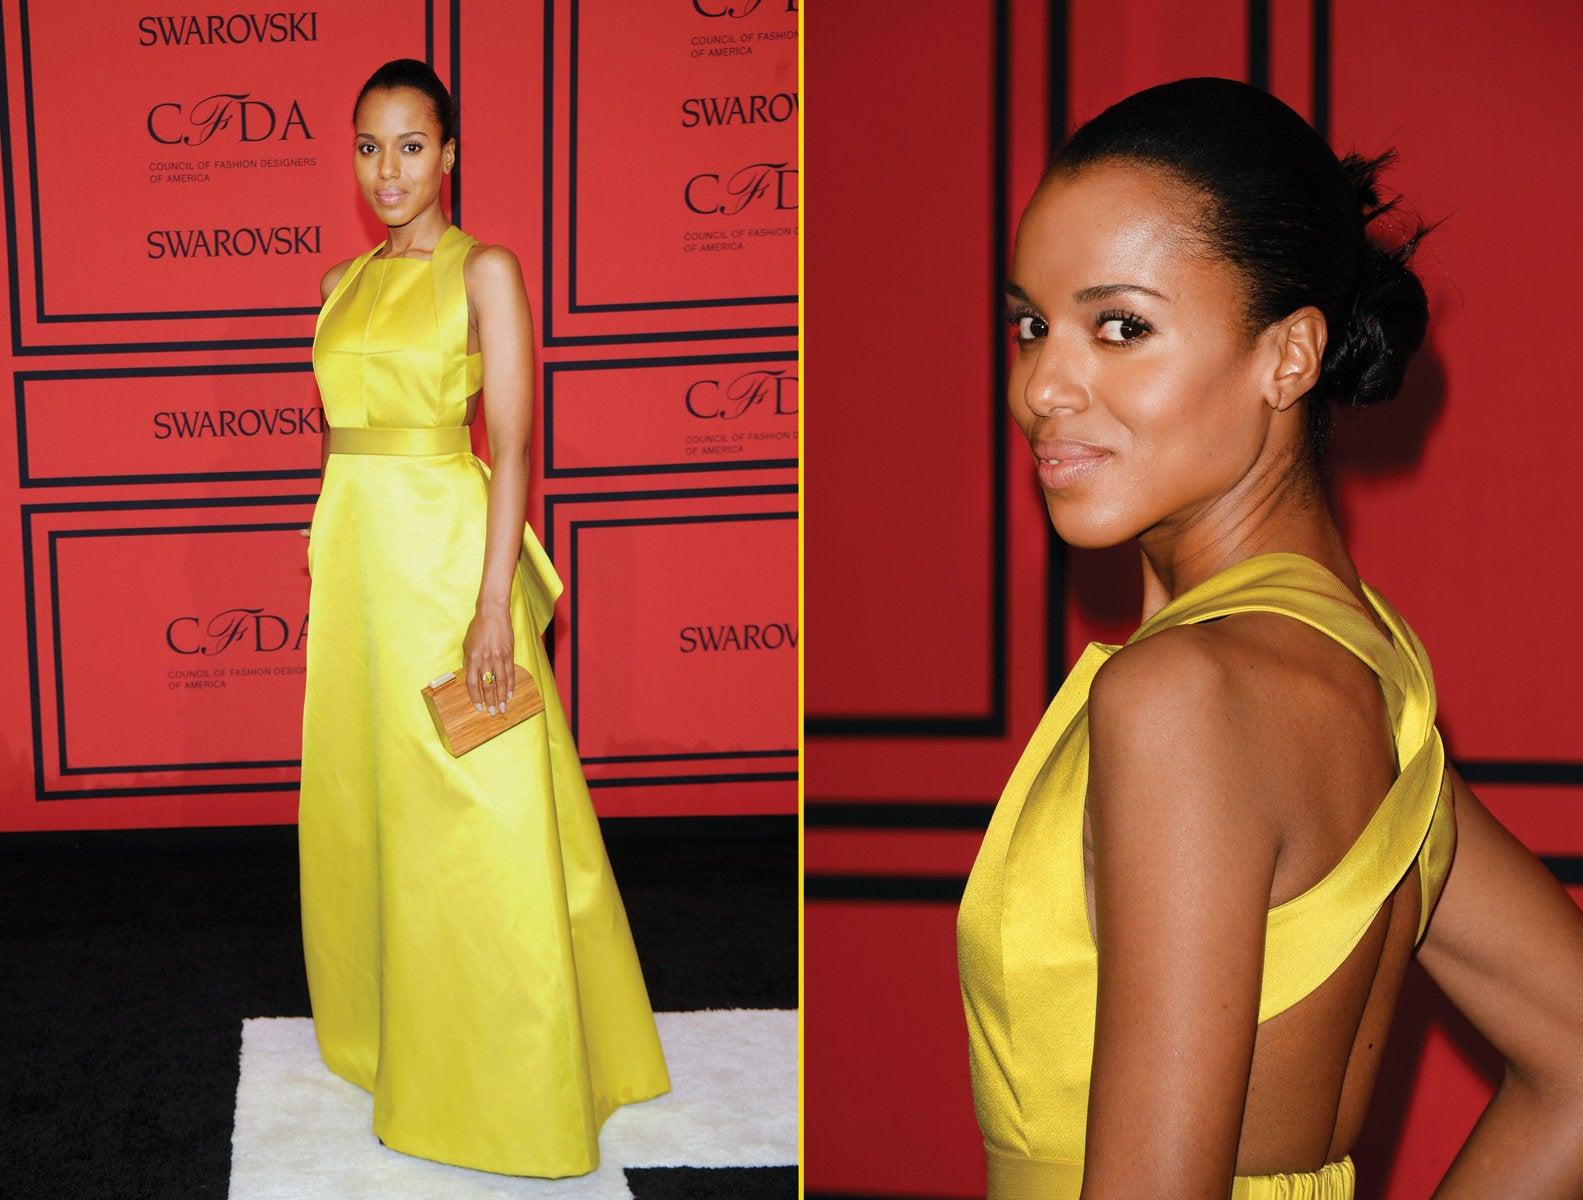 Get the Look: Kerry Washington's Glowing Makeup at the CFDA Awards